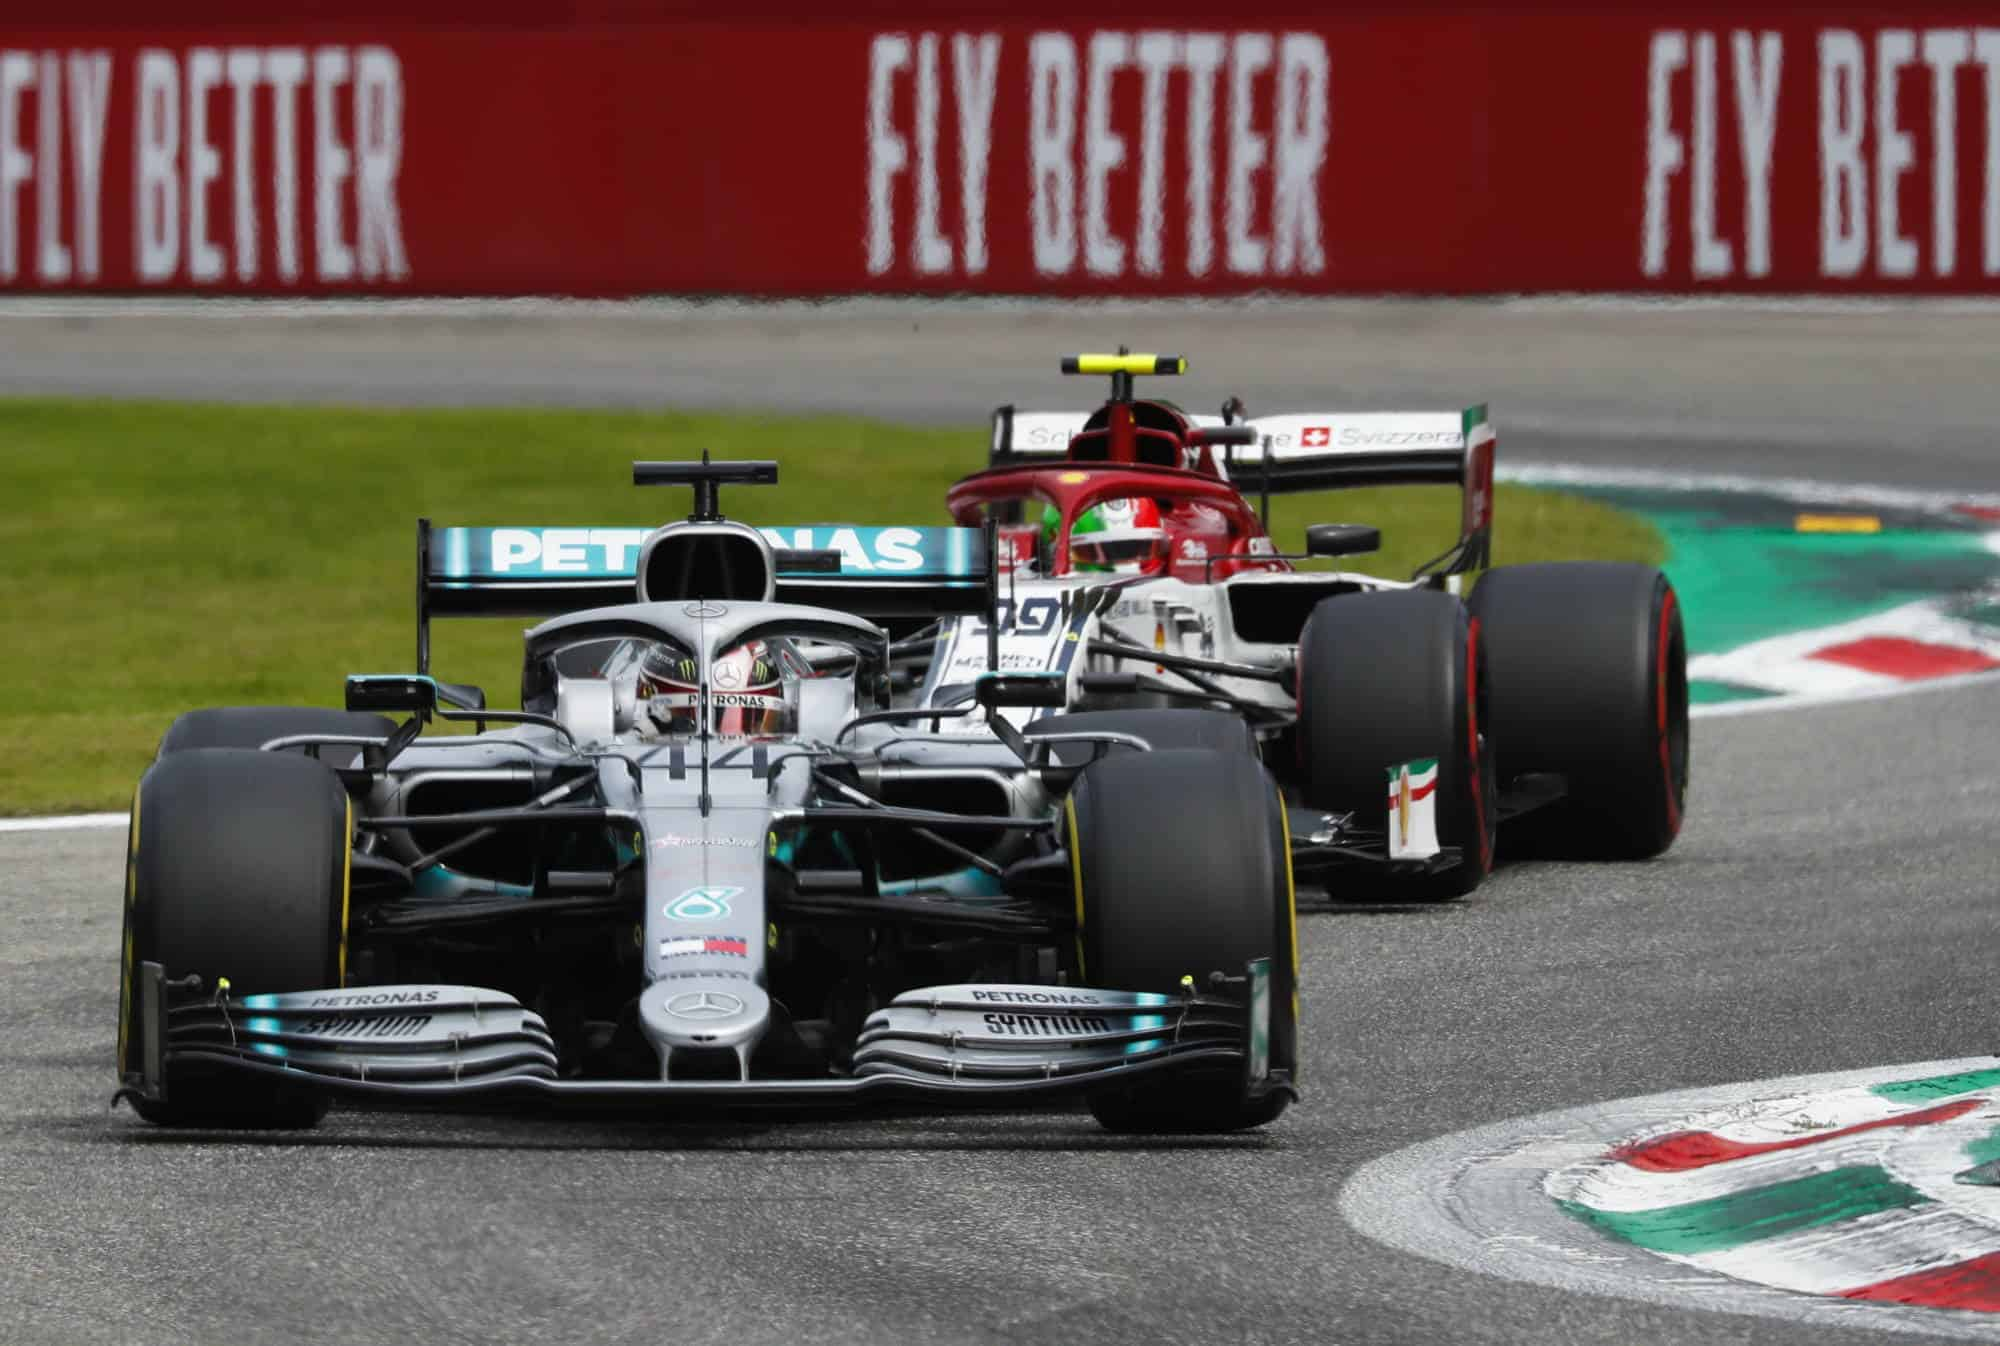 Lewis Hamilton Mercedes F1 W10 Italian GP F1 2019 Monza Ascari chicane with Antonio Giovinazzi Alfa Romeo C38 Photo Daimler